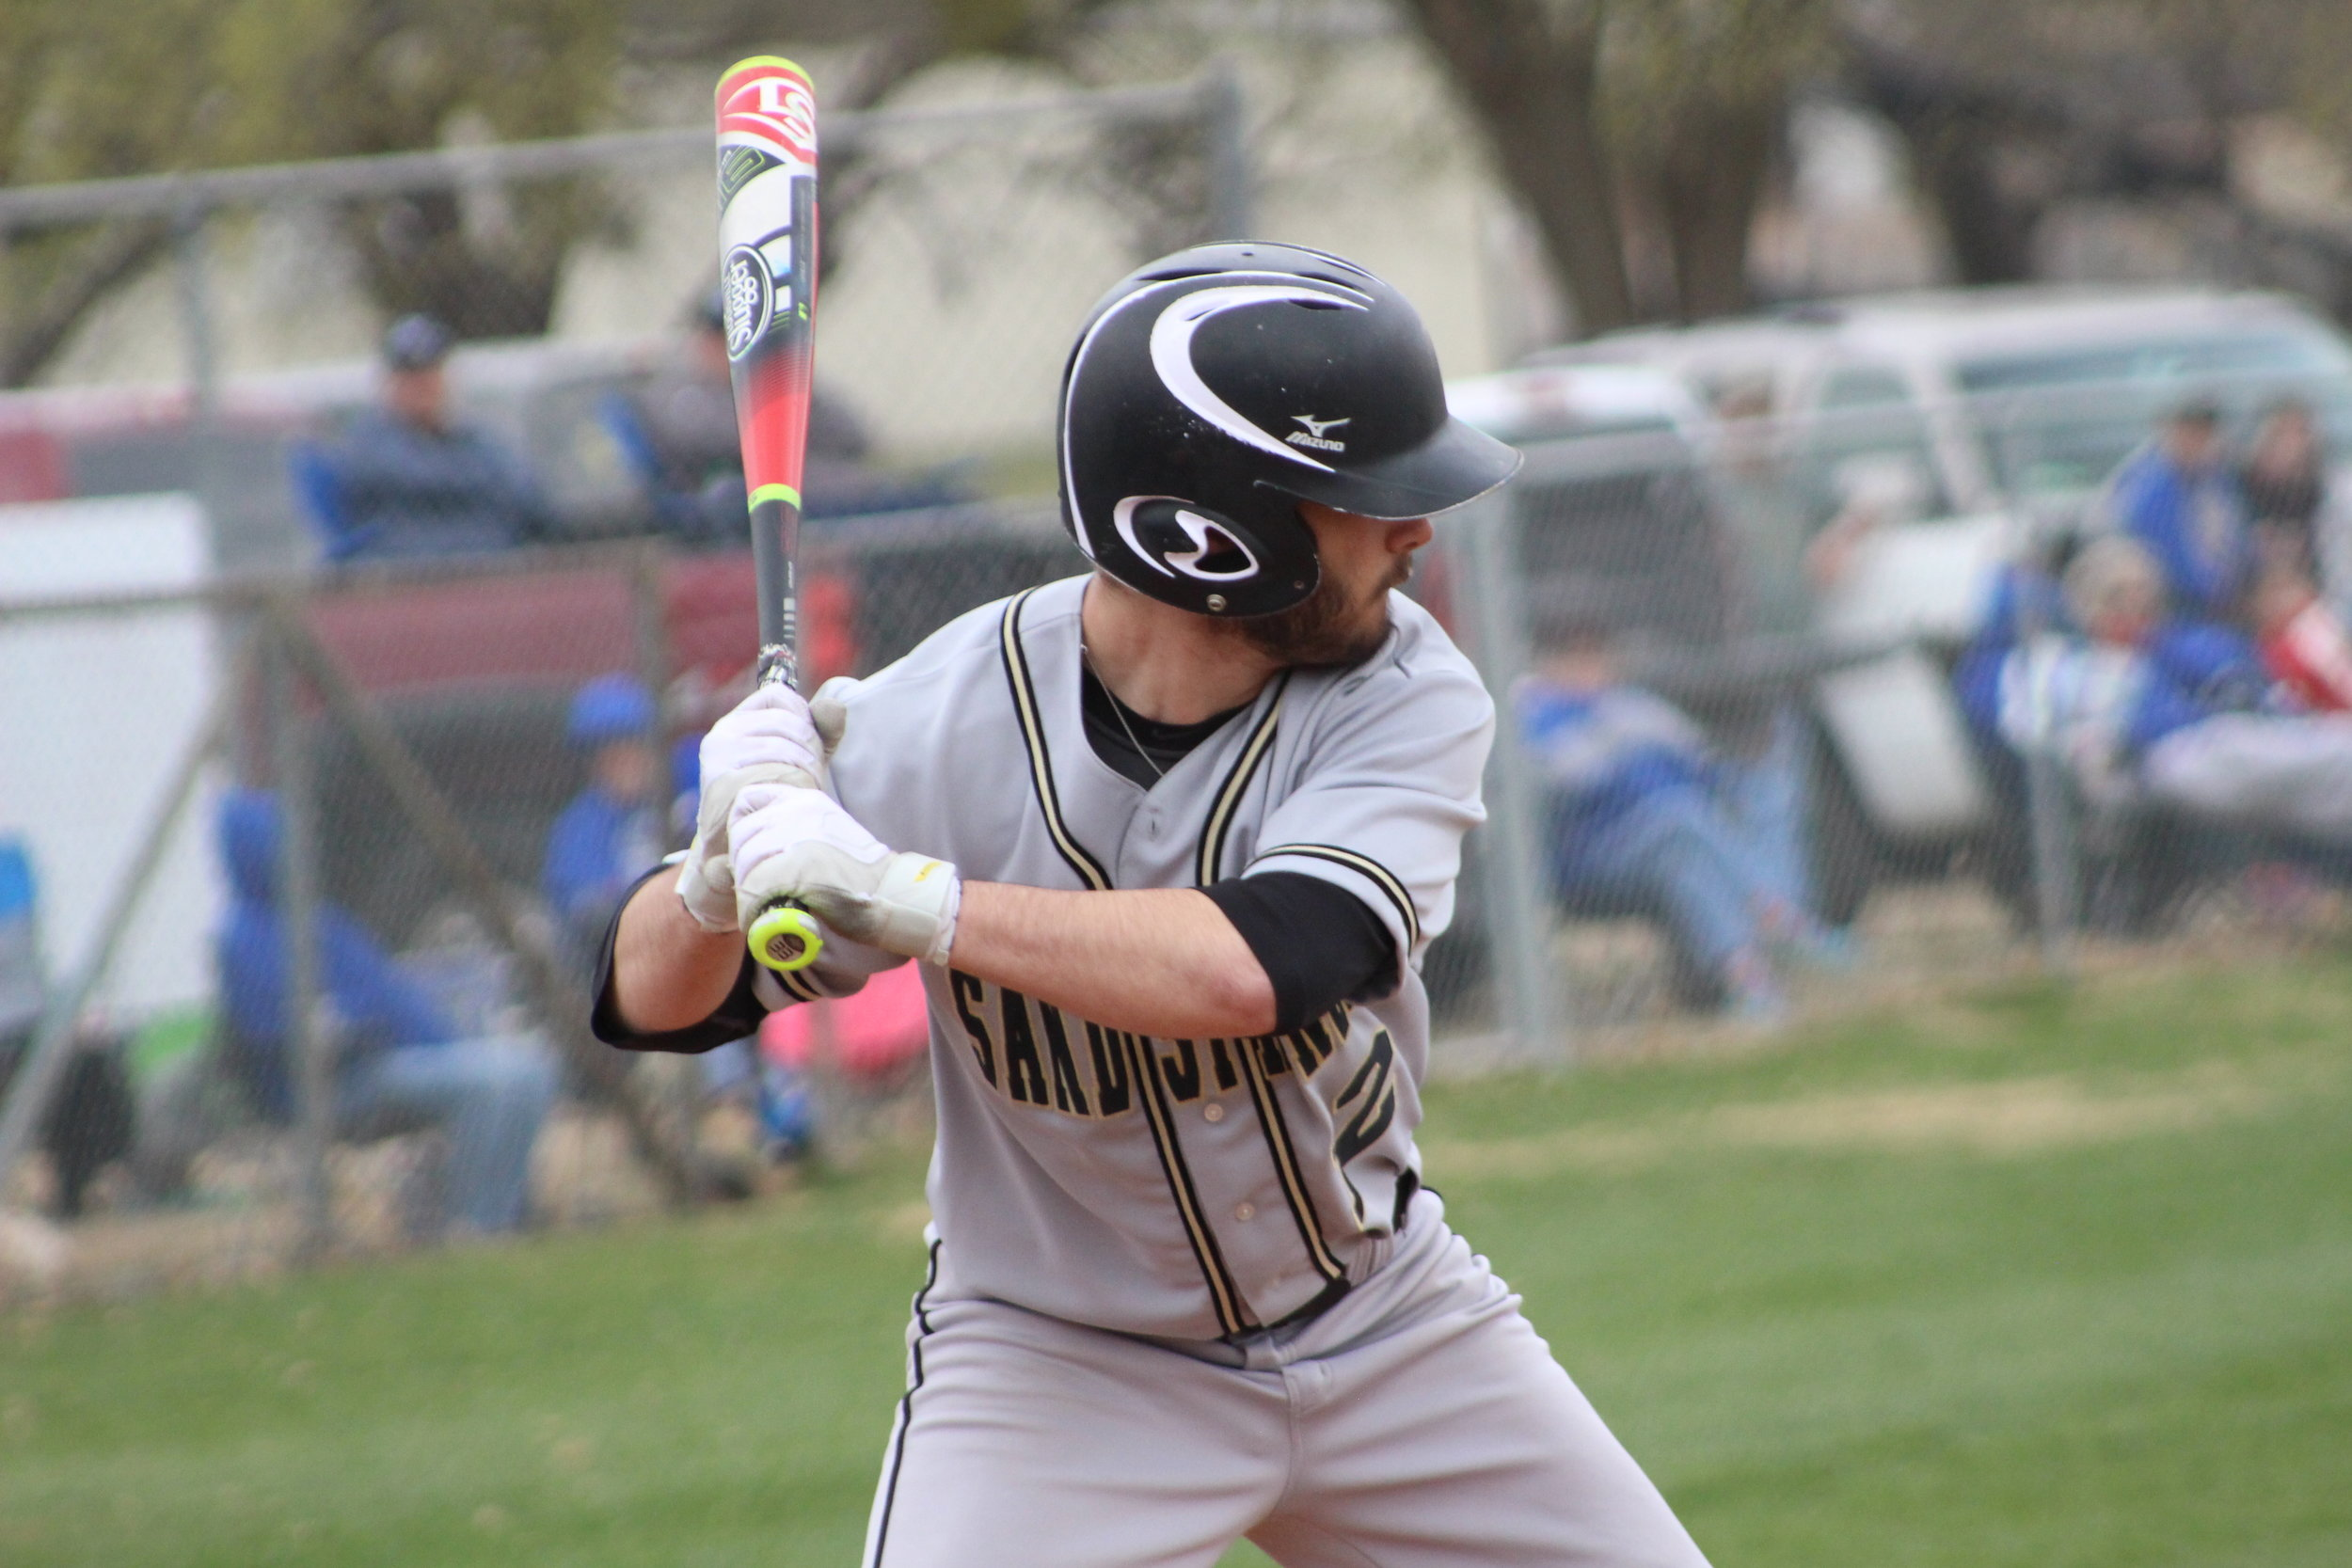 CPHS Senior Treyce Tolbert hit a 2RBI home run to give Sand Springs the lead. (Photo: Scott Emigh).